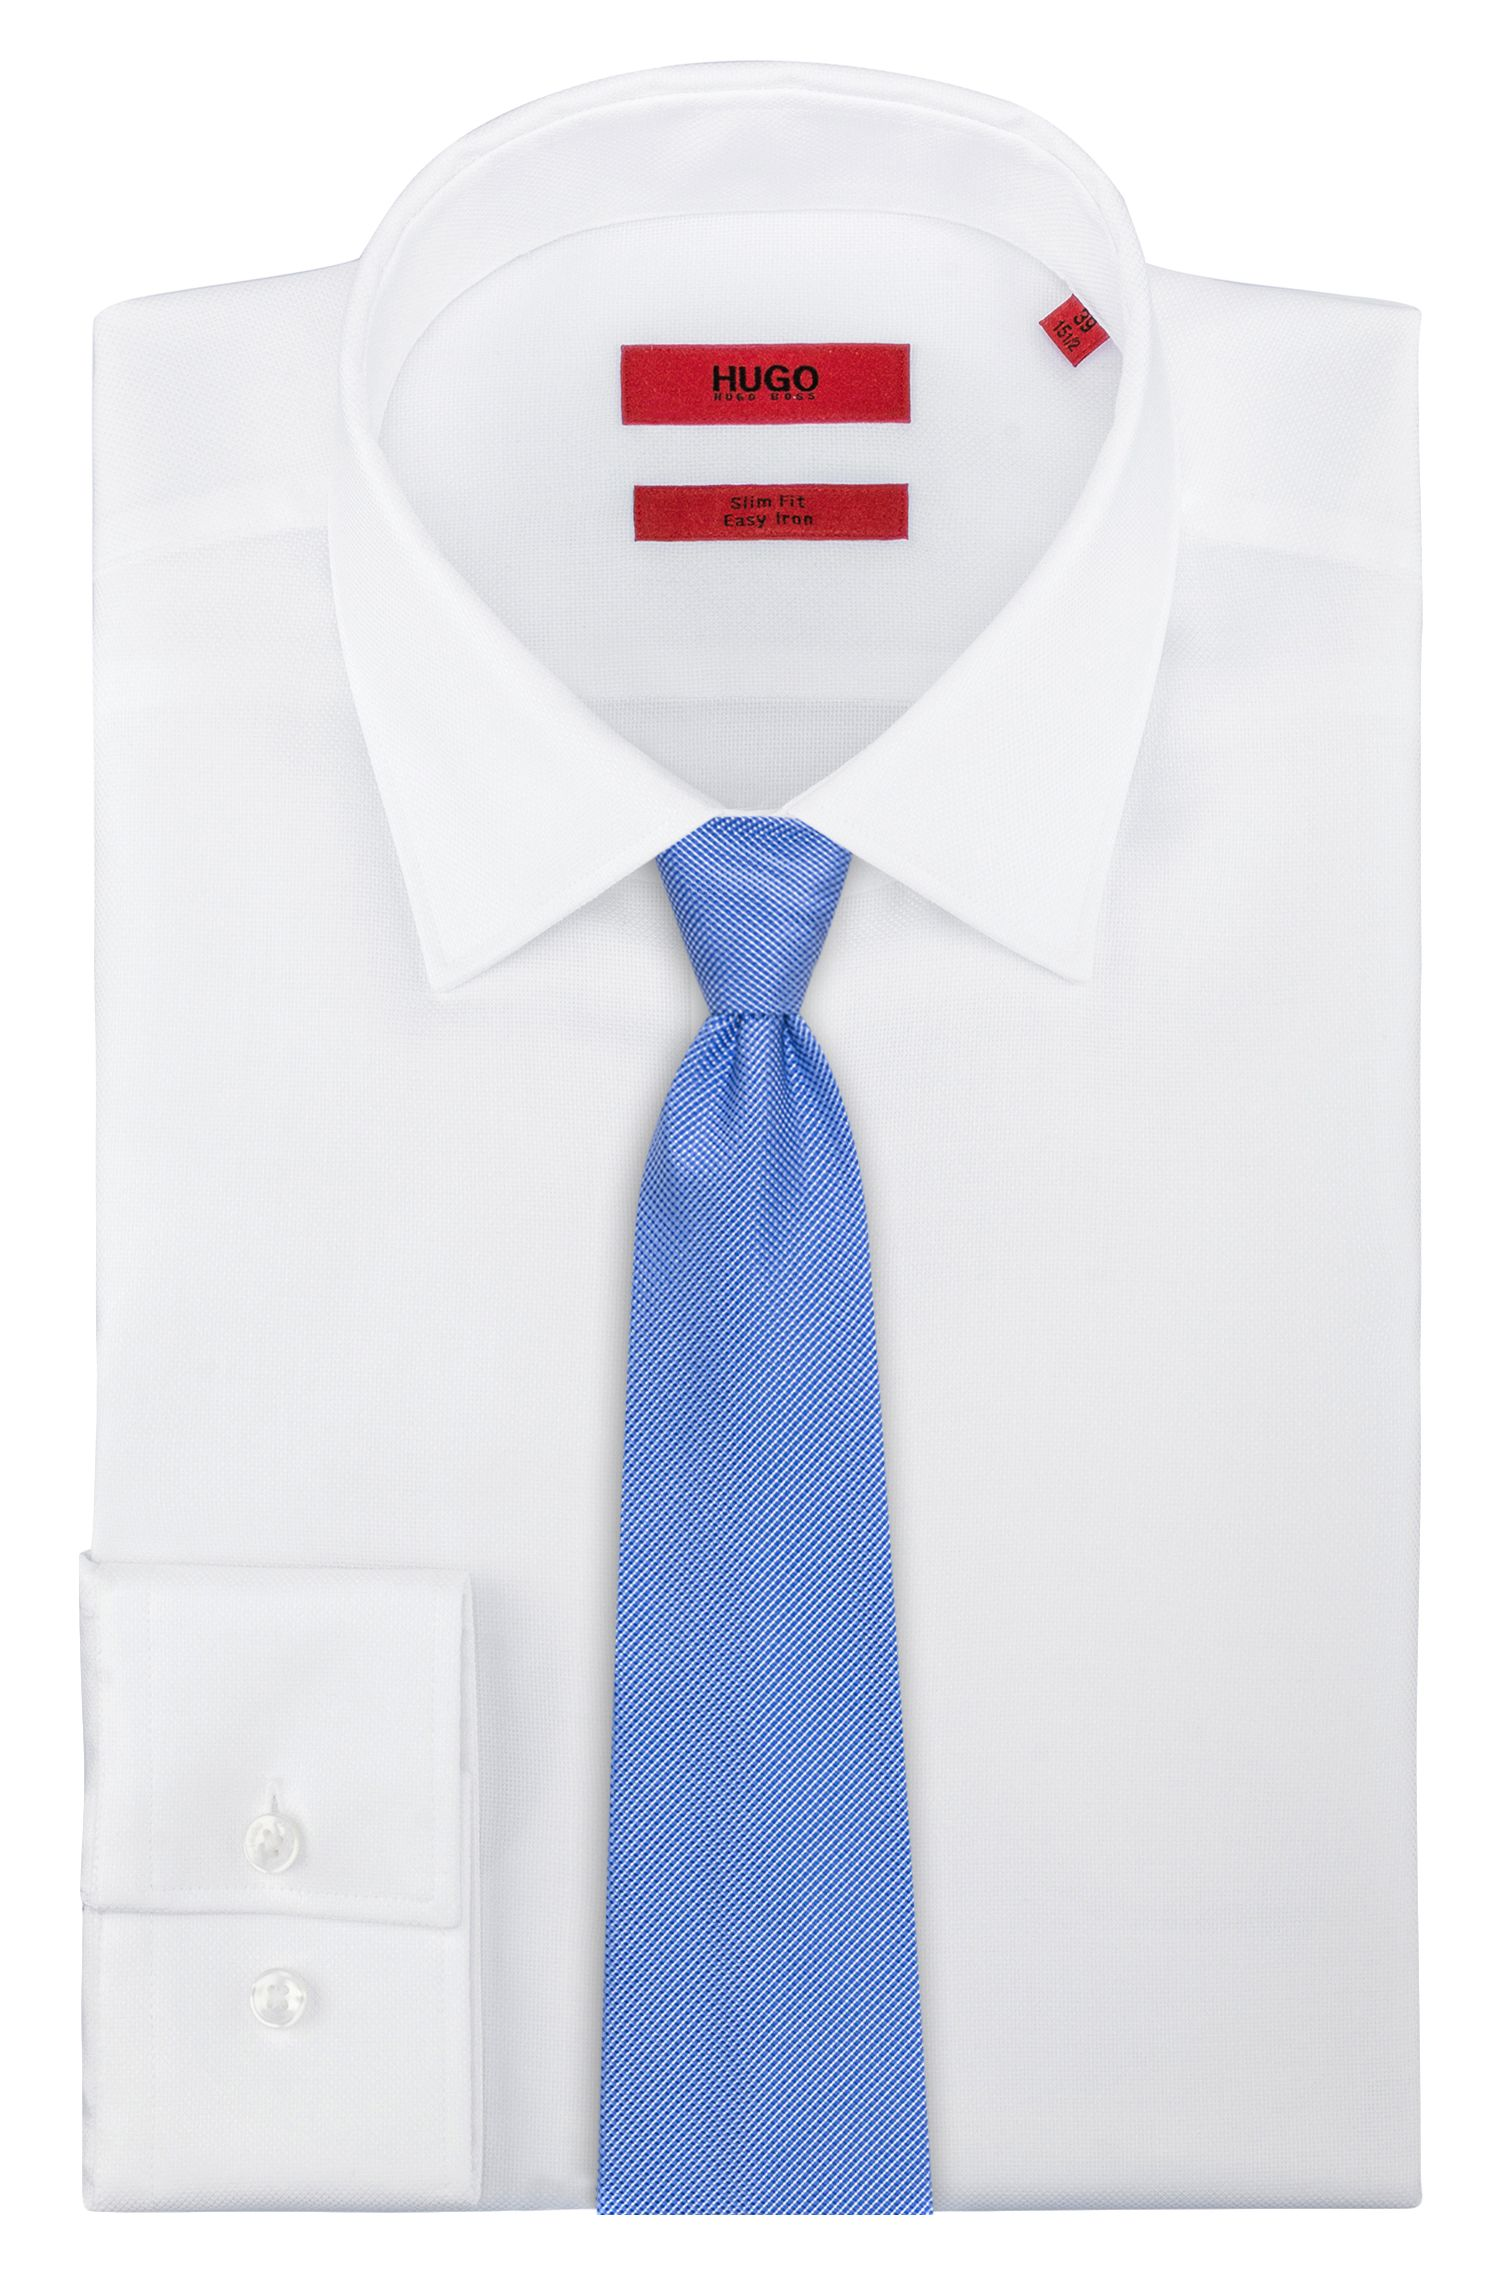 Krawatte aus Seiden-Jacquard mit dezentem Punkte-Muster, Blau